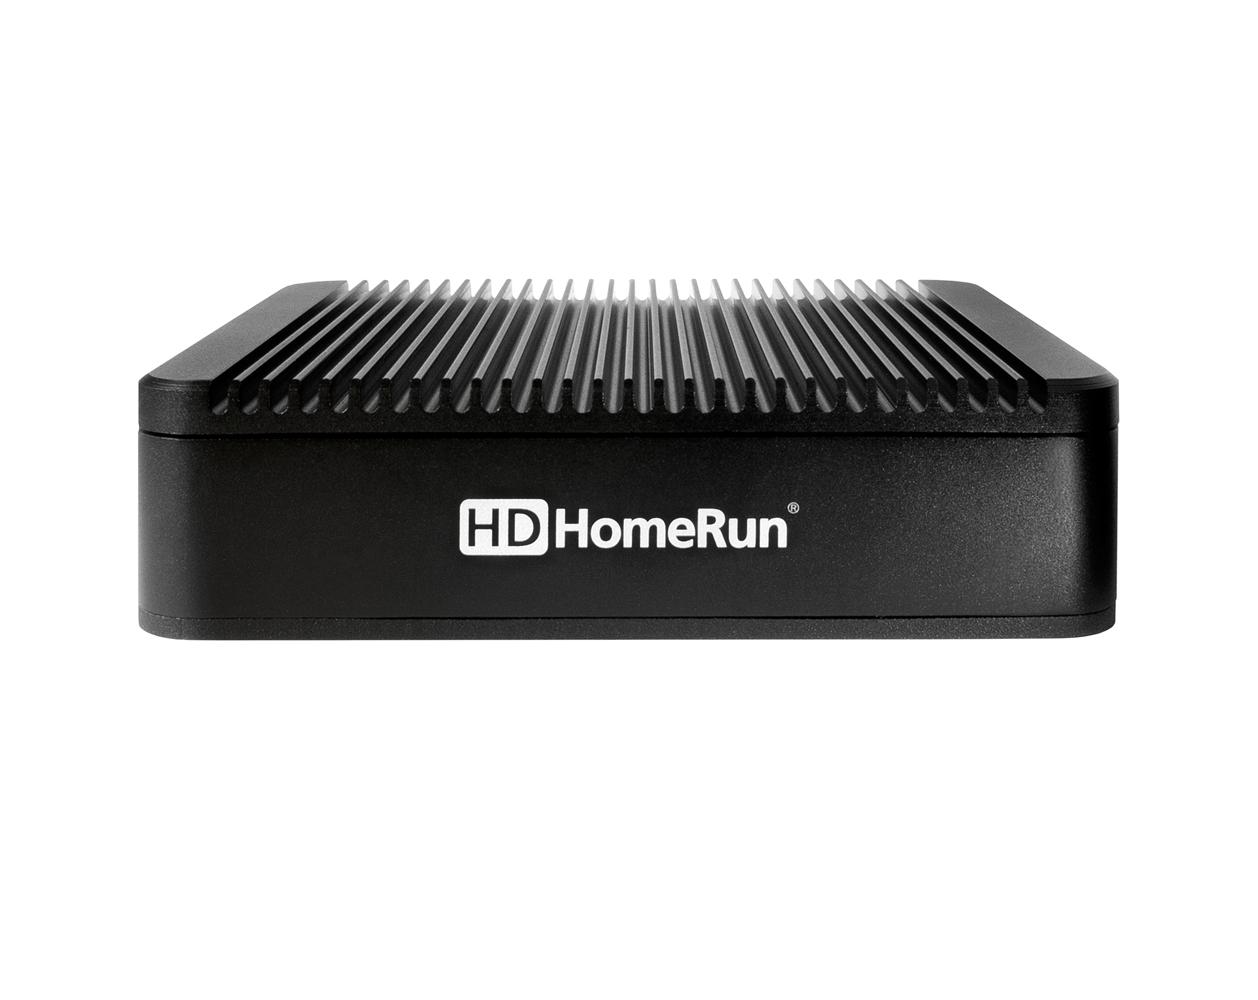 SiliconDust - HDHomeRun EXTEND - Black $149.99